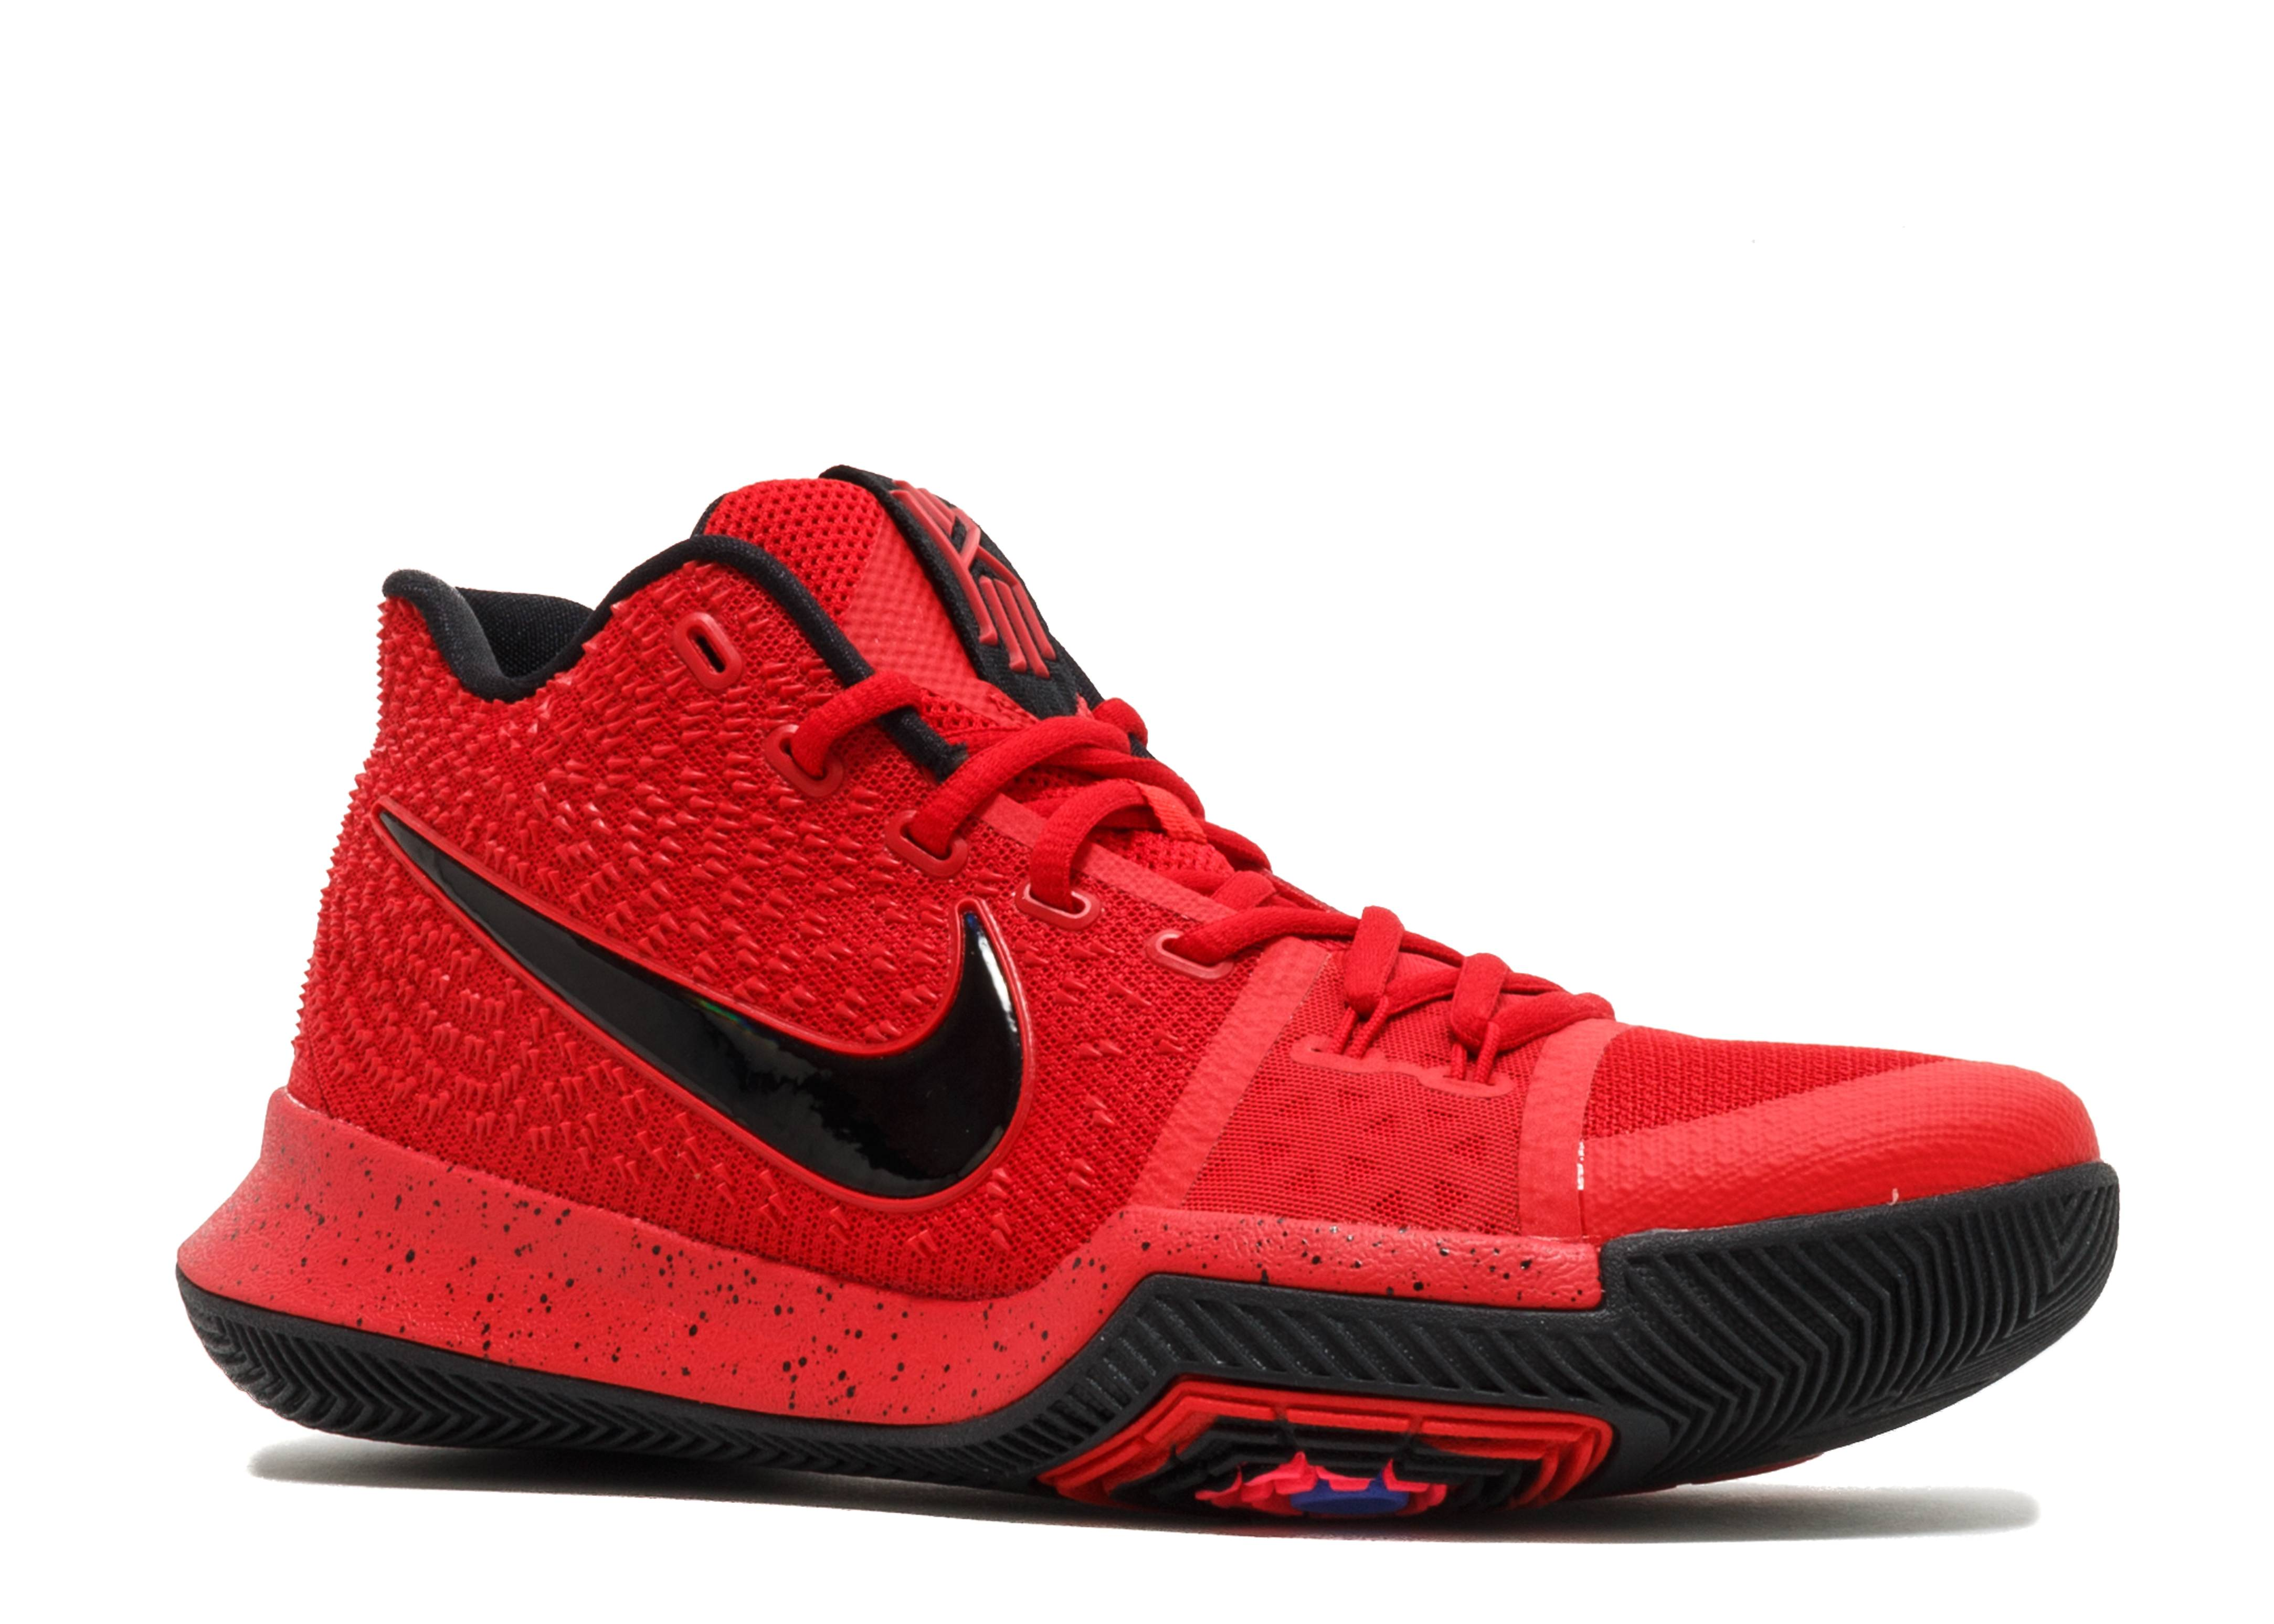 best loved 0c2f5 25fdc Kyrie 3 - Nike - 852395 600 - university red black-team red   Flight Club